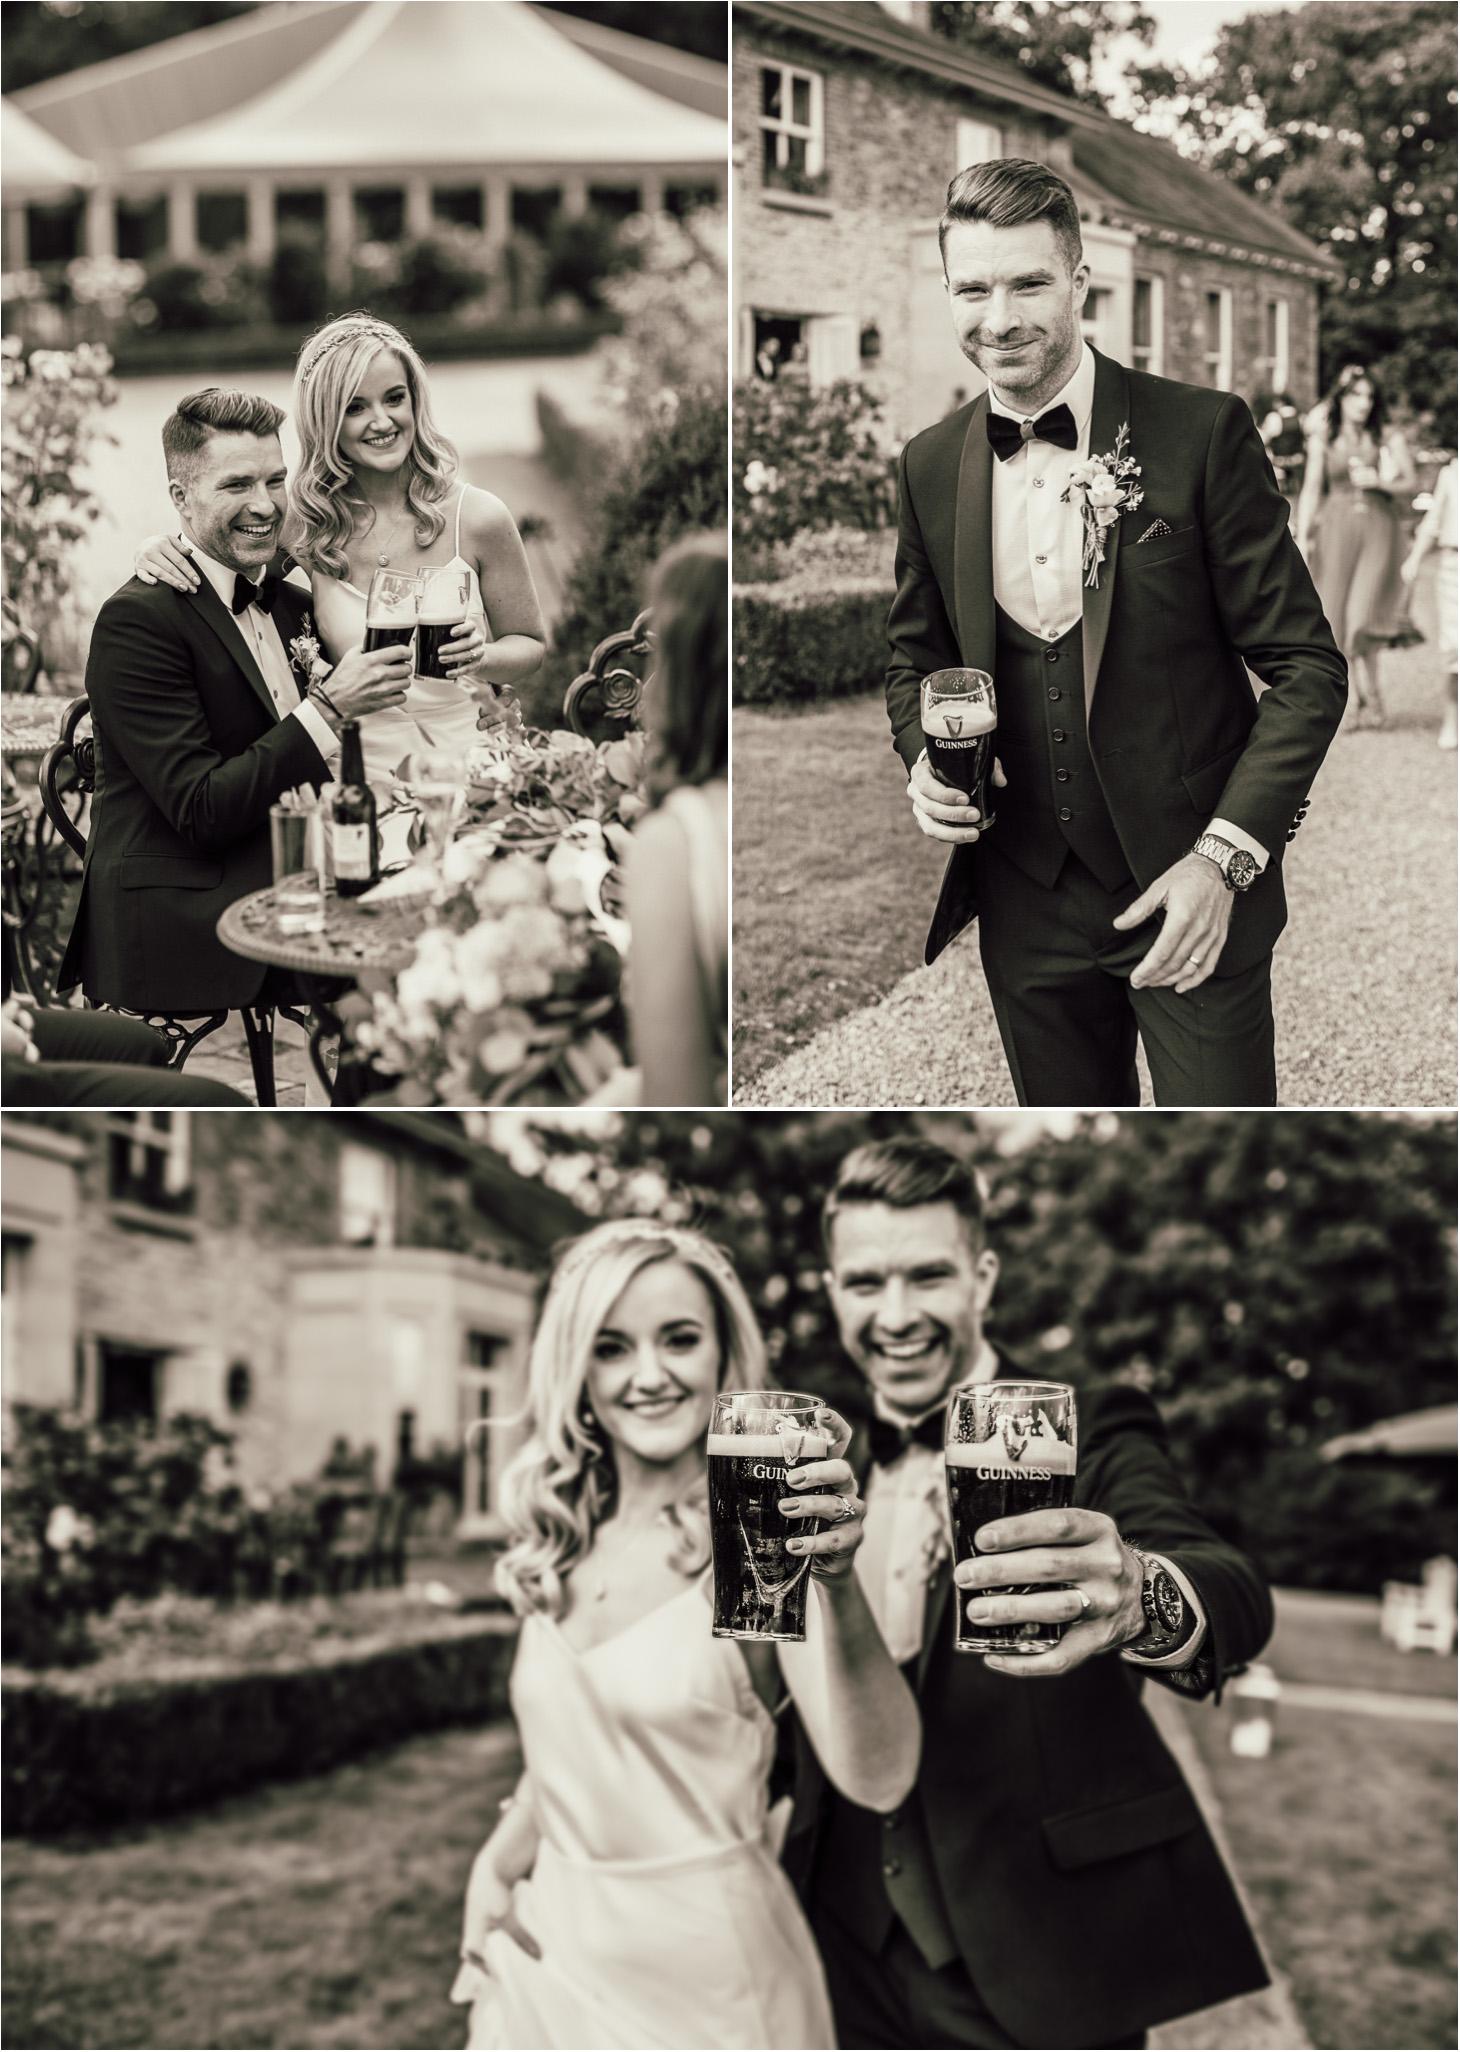 Virgina Lodge Photography. darren fitzpatrick. Wedding.22